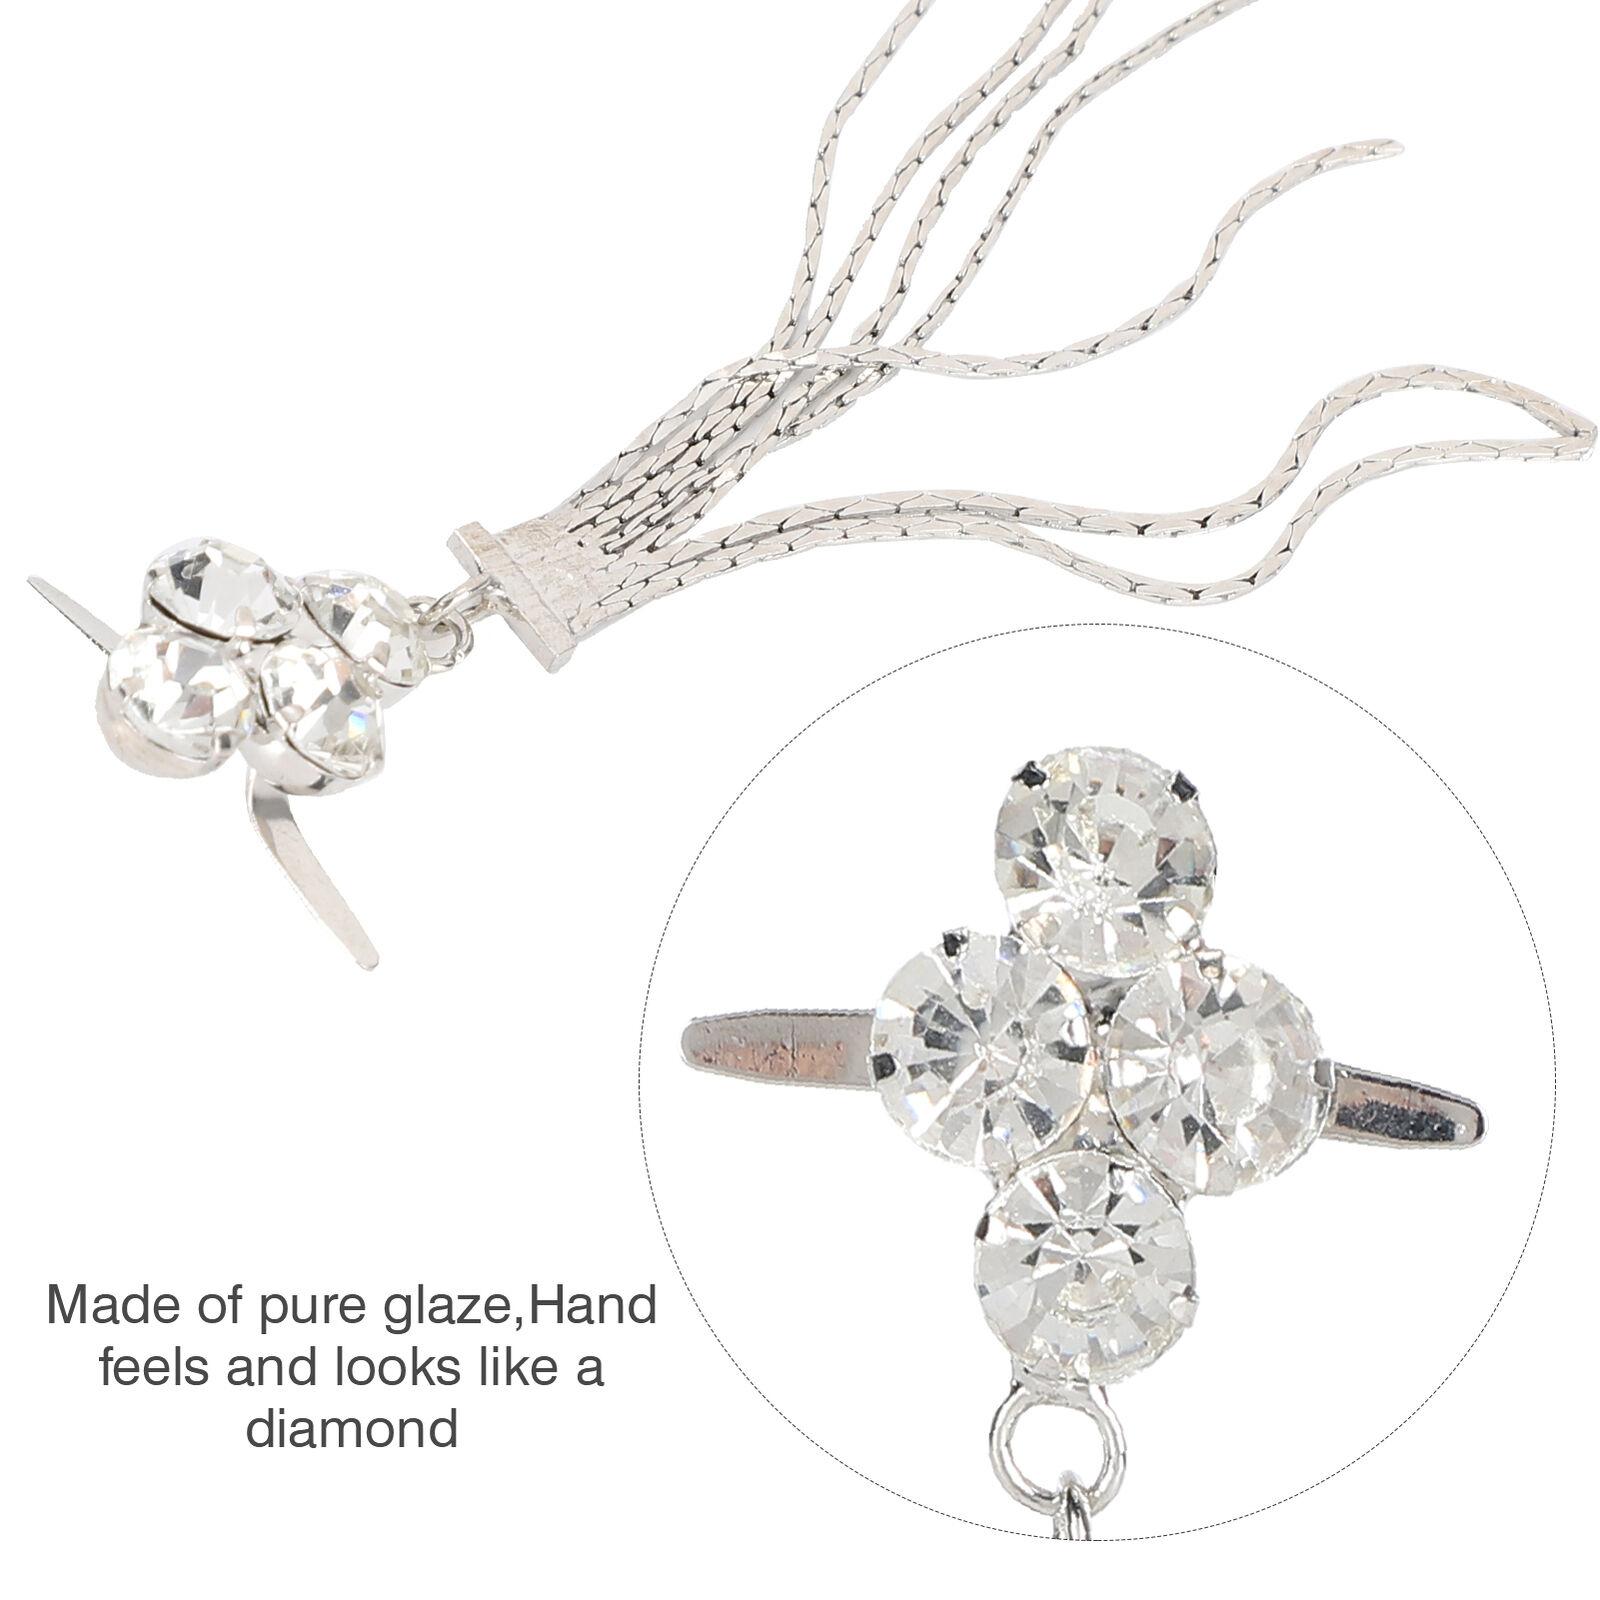 4Pcs Shoe Clips 4 Diamond Tassel Claw Chain Boots Buckle Decoration Accessories